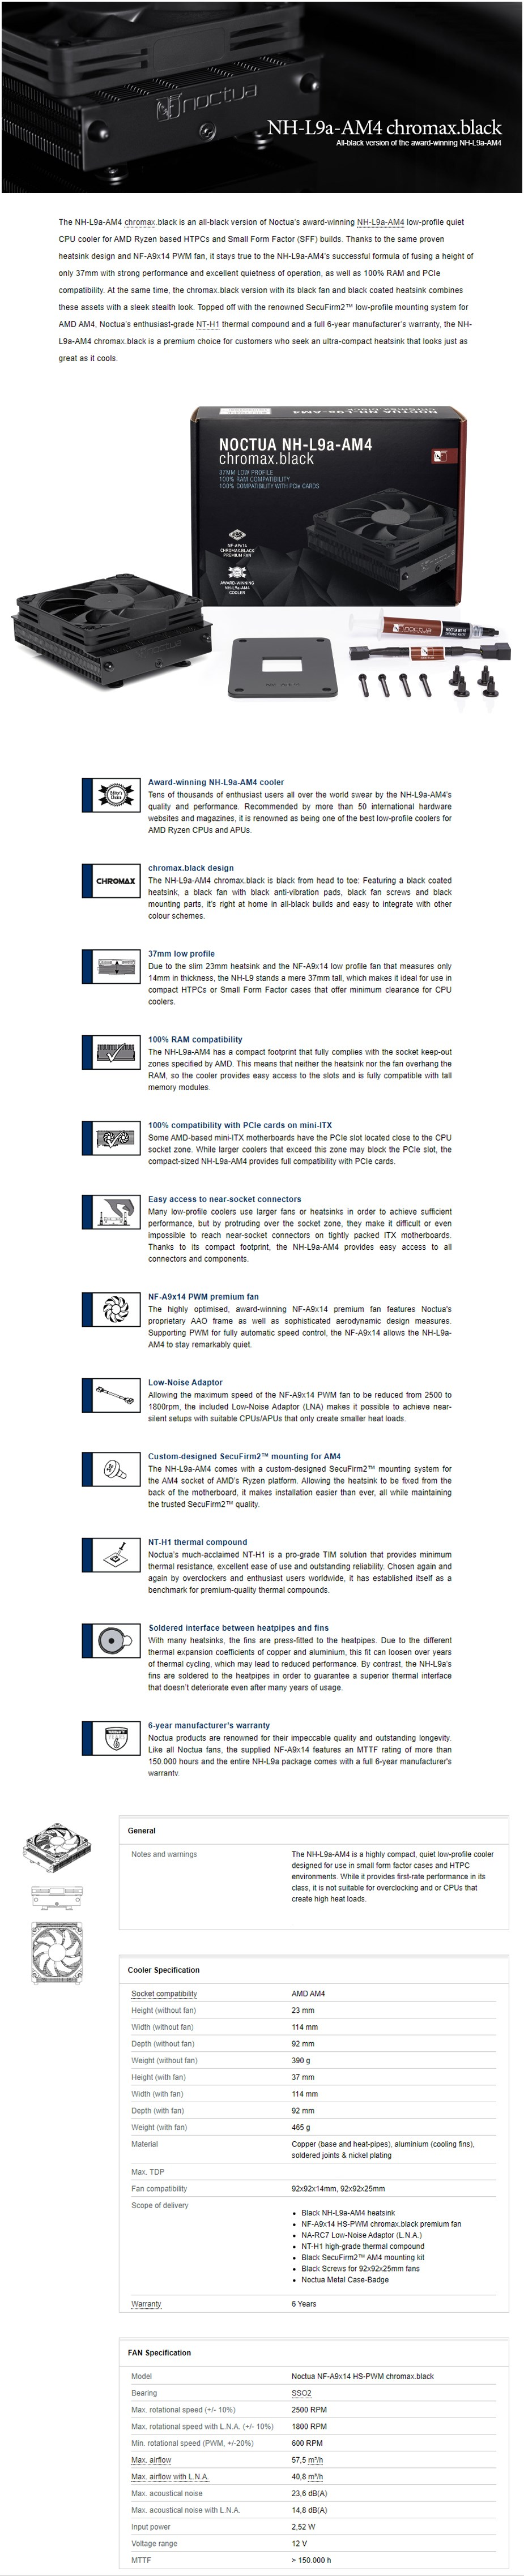 Noctua NH-L9a-AM4 AMD Low Profile CPU Cooler - Chromax Black - Overview 1